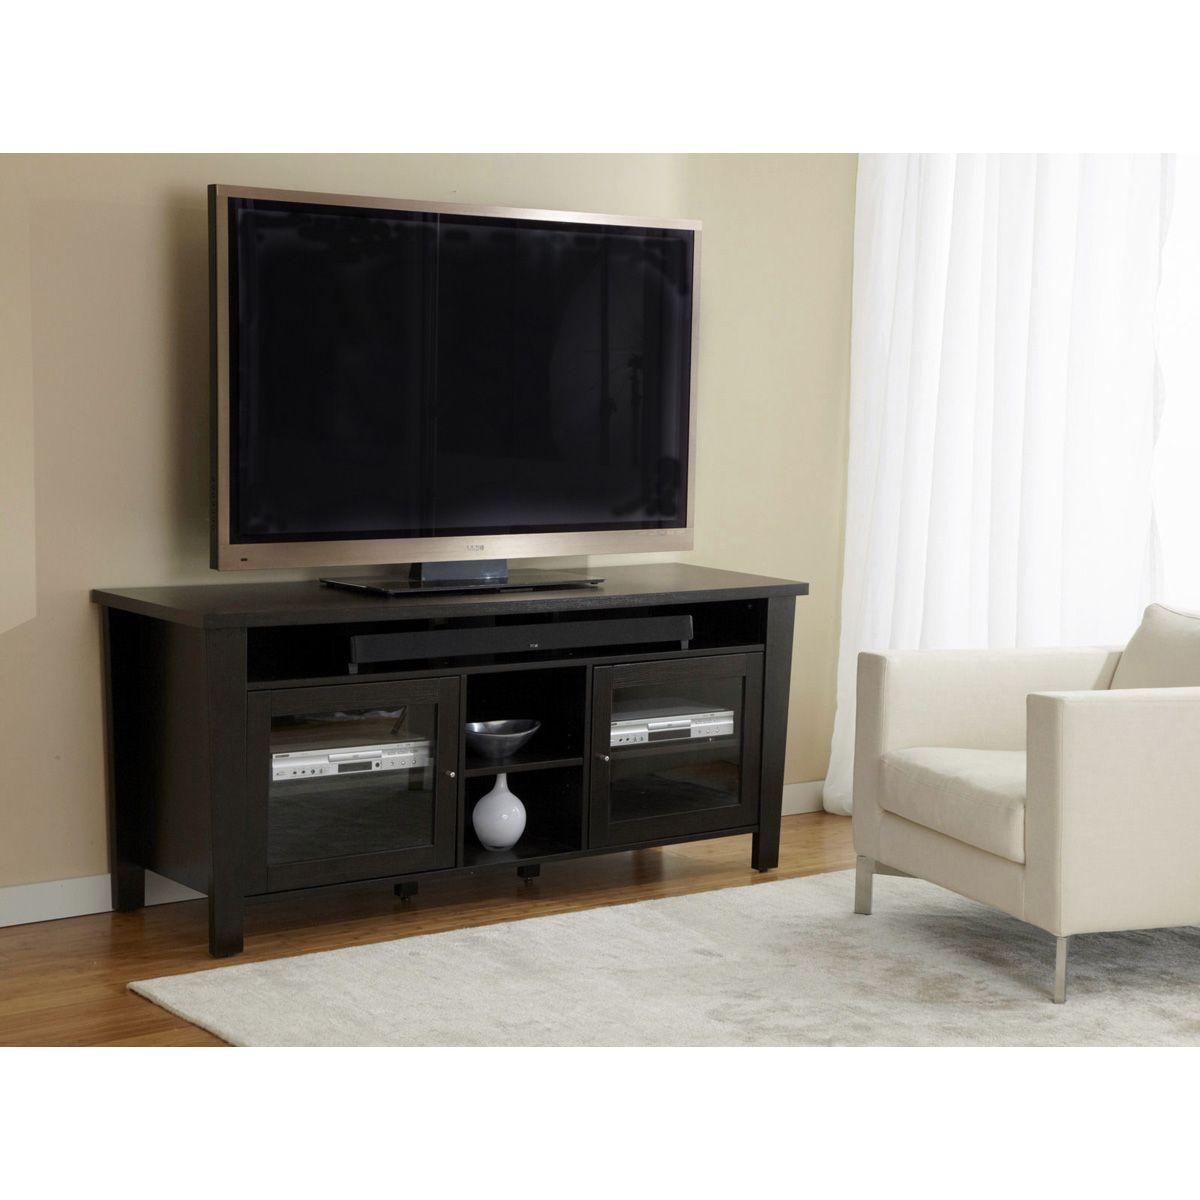 900 Collection Modern Tv Cabinet 70 With Soundbar Shelf Modern Tv Cabinet Tv Cabinets Storage Entertainment Center Soundbar for 70 inch tv